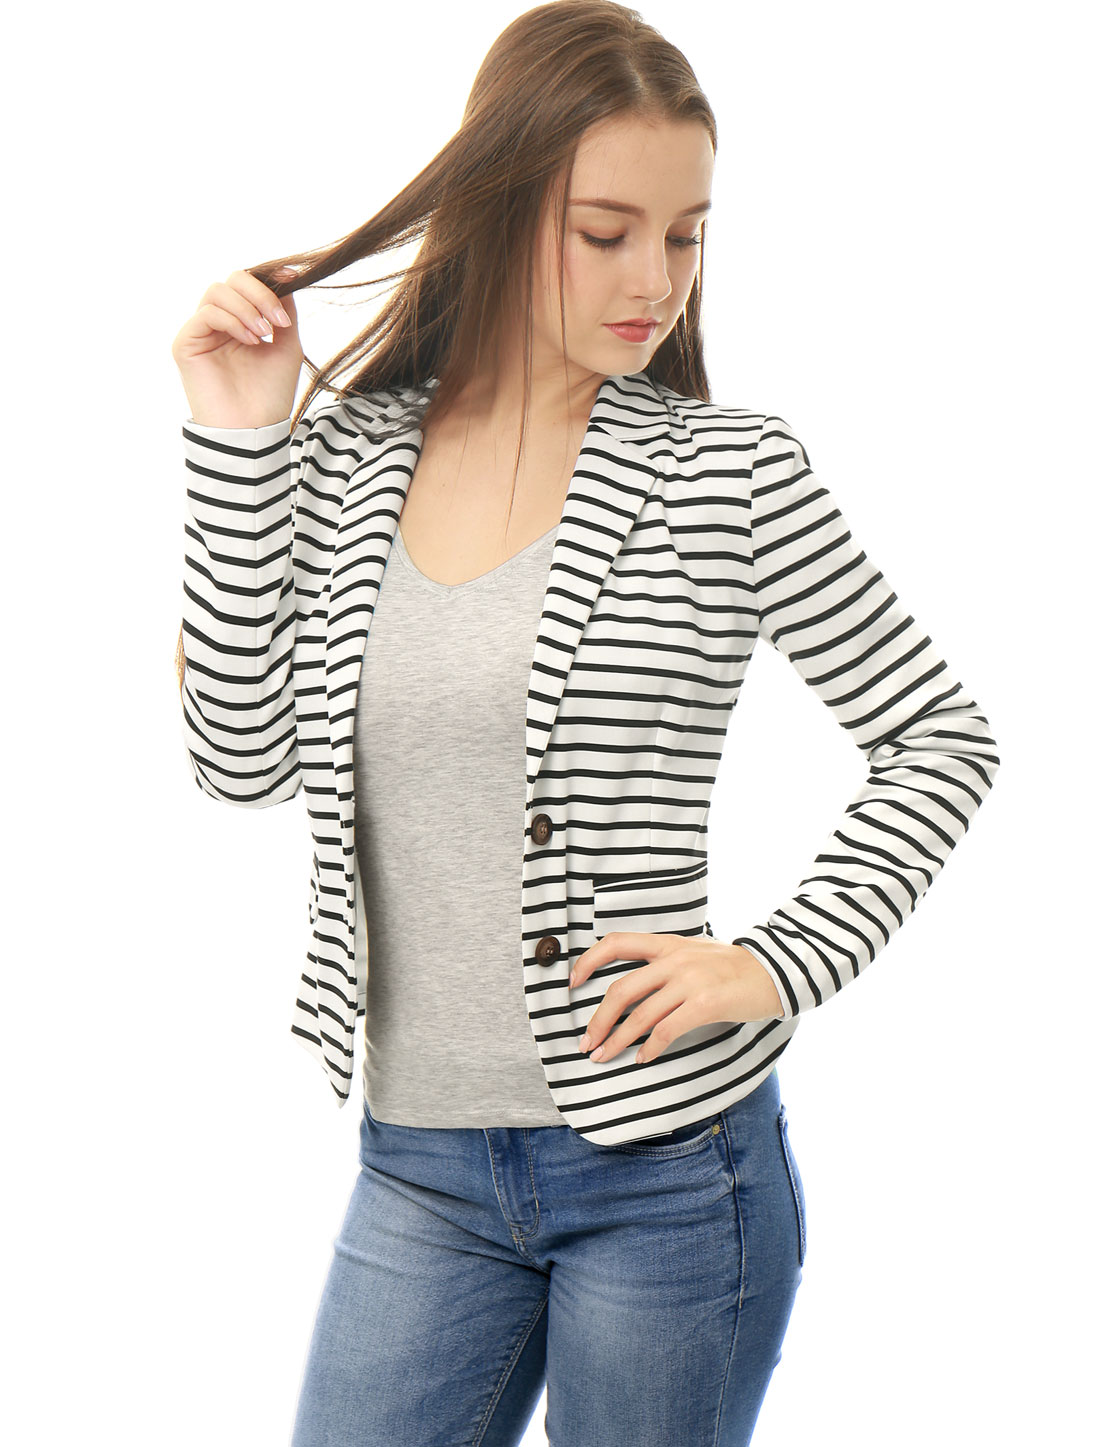 Allegra K Women Notched Lapel Button Closure Striped Blazer White S